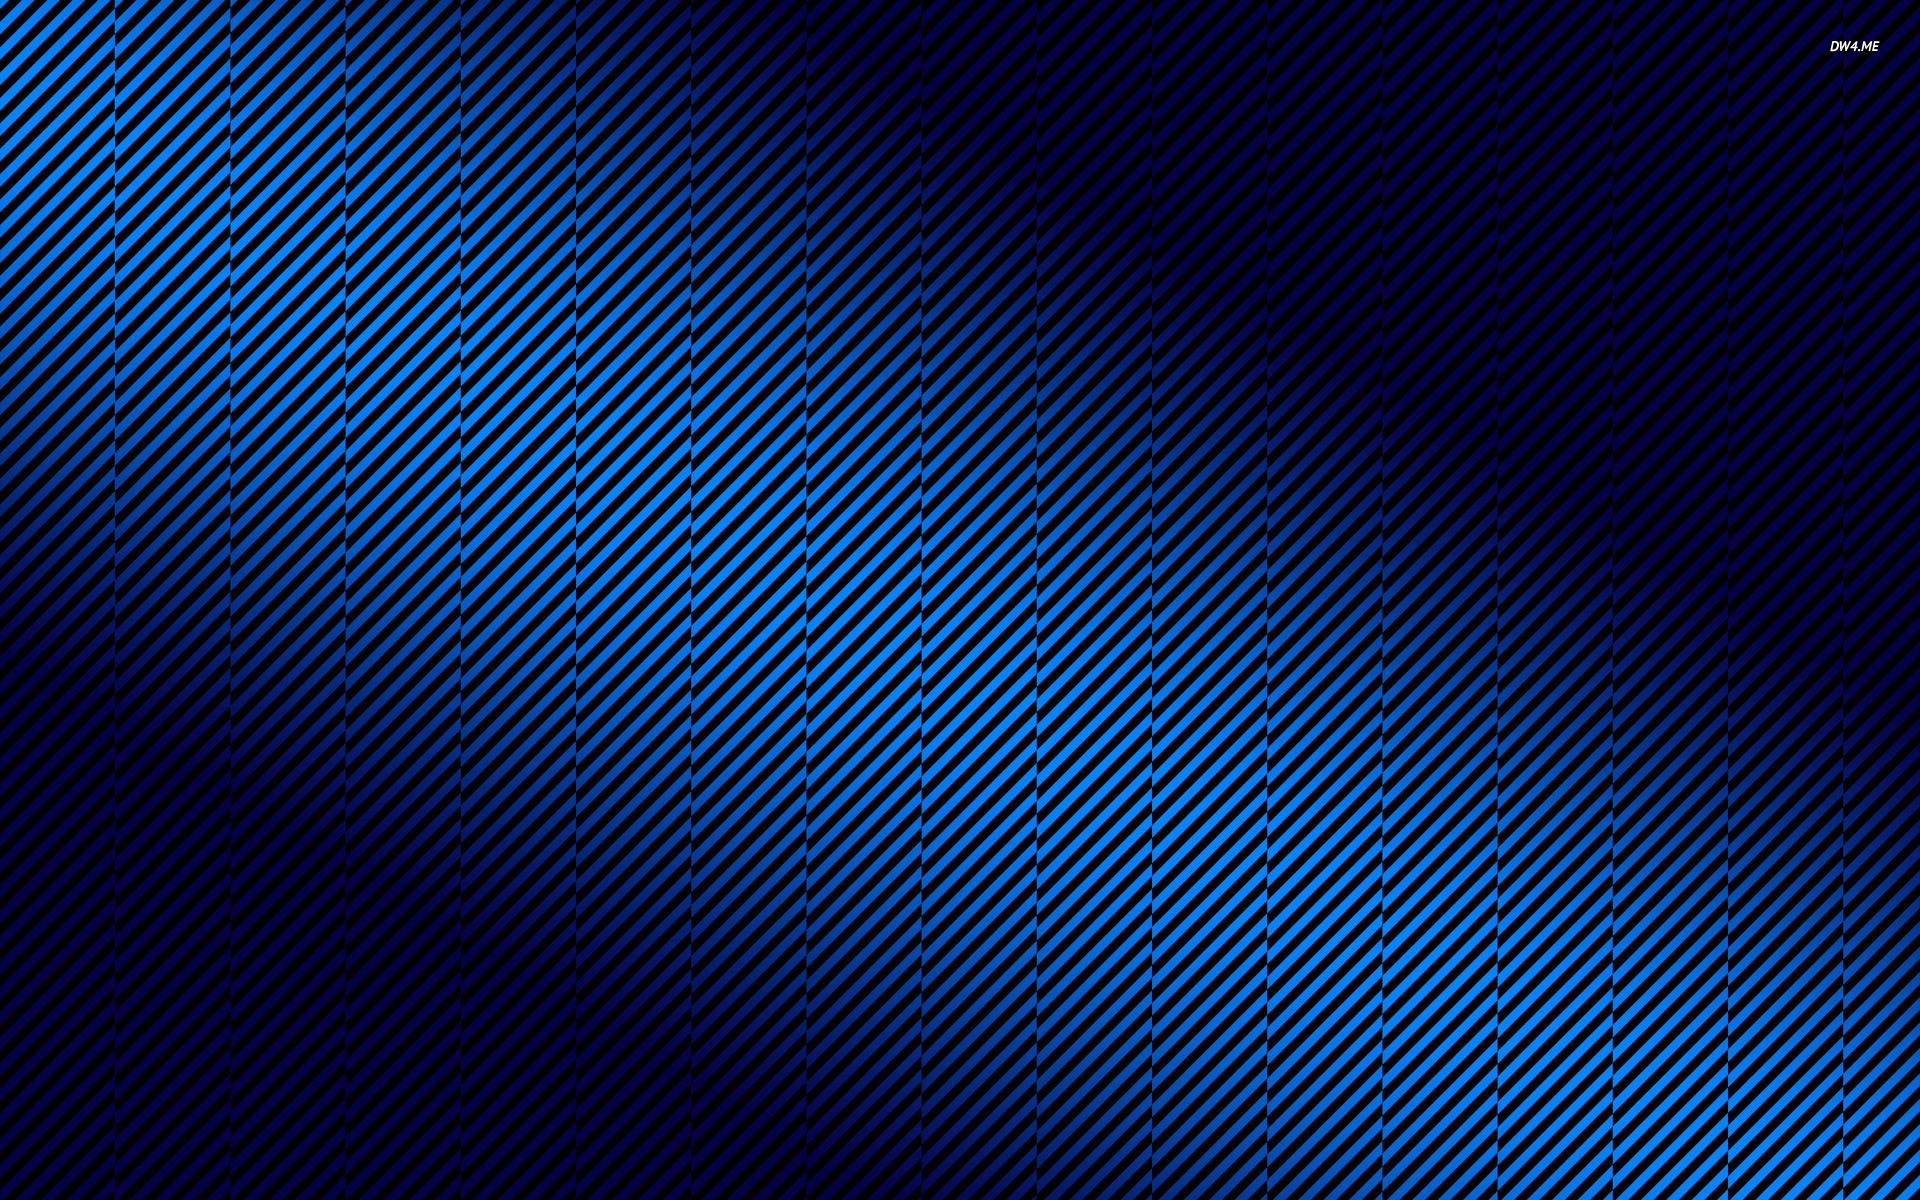 Blue diagonal stripes wallpaper   Digital Art wallpapers   1287 1920x1200